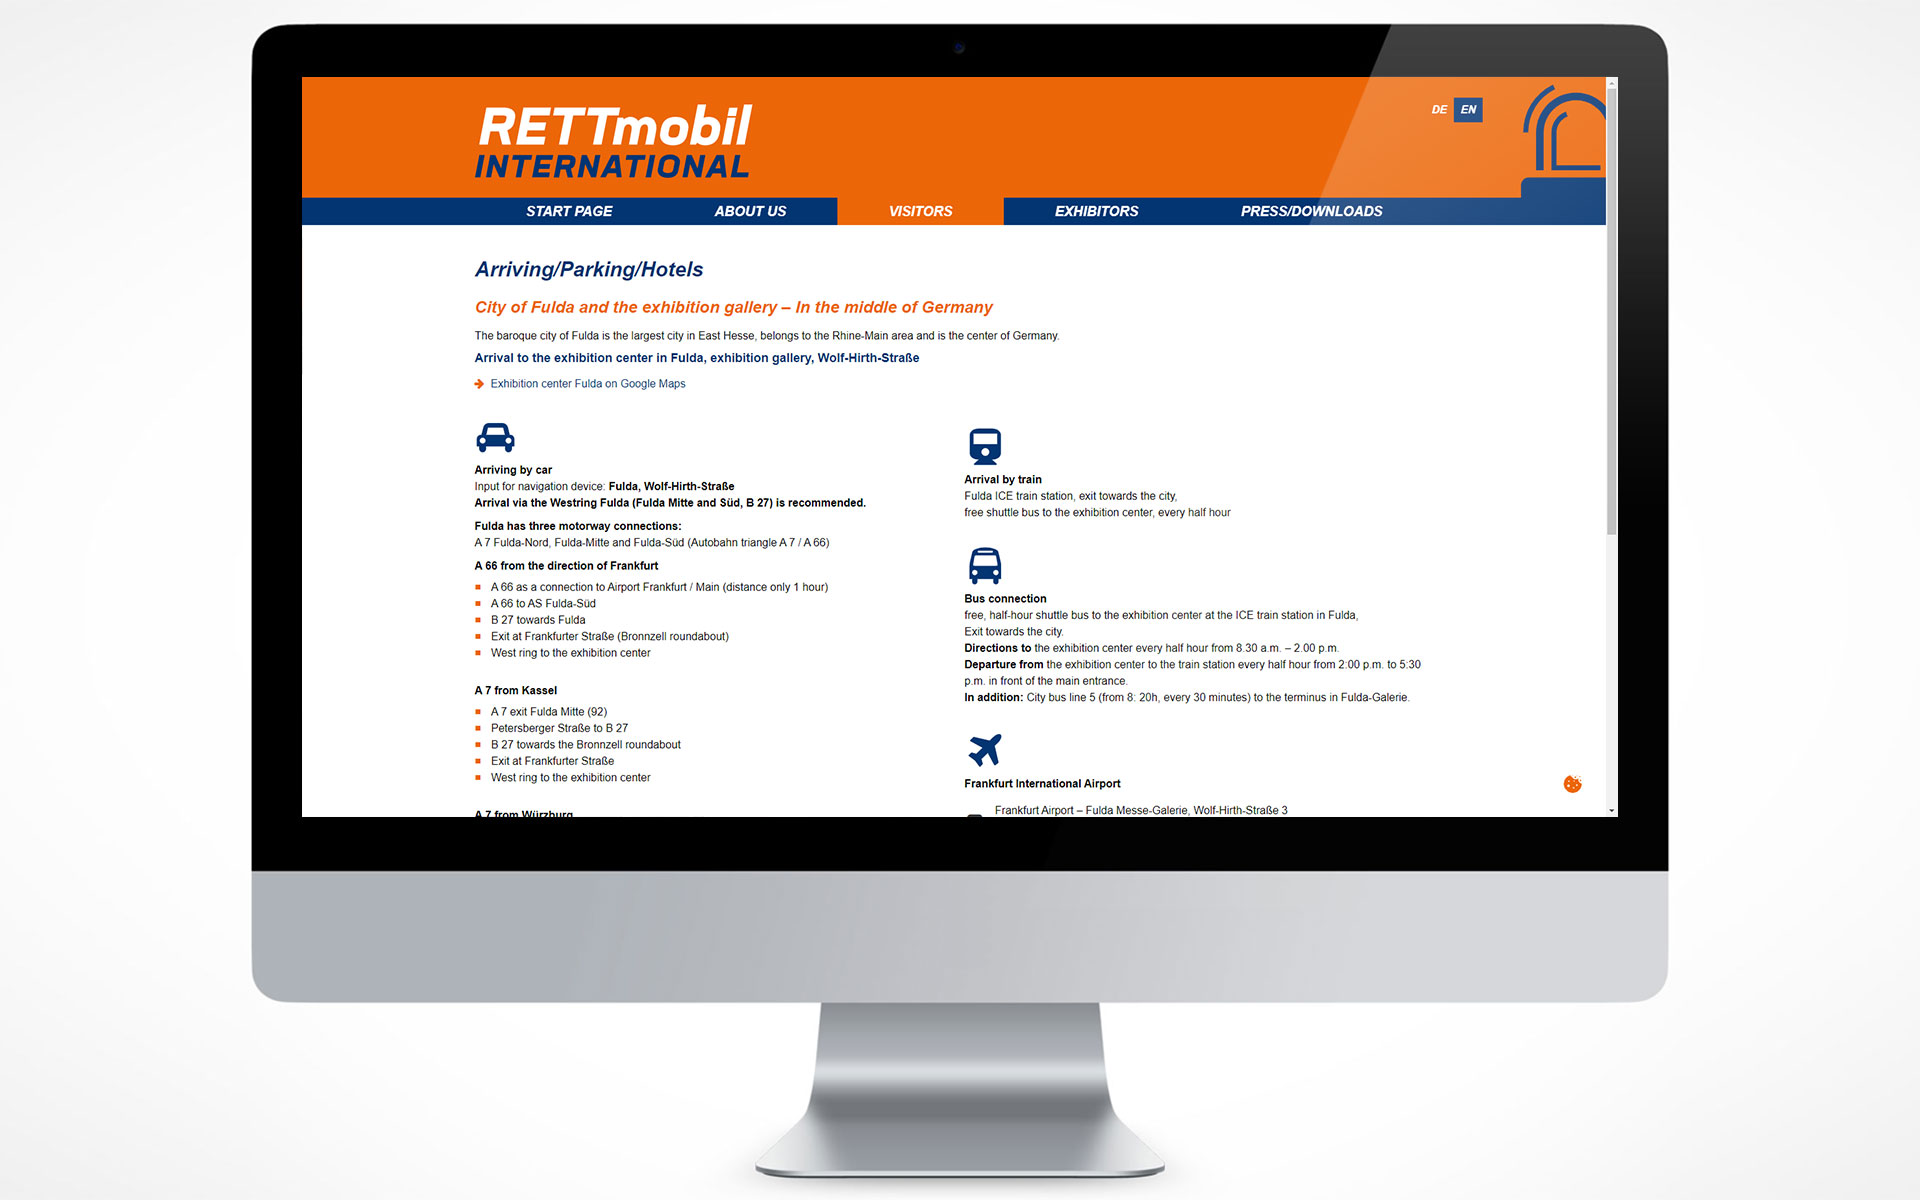 RETTmobil international